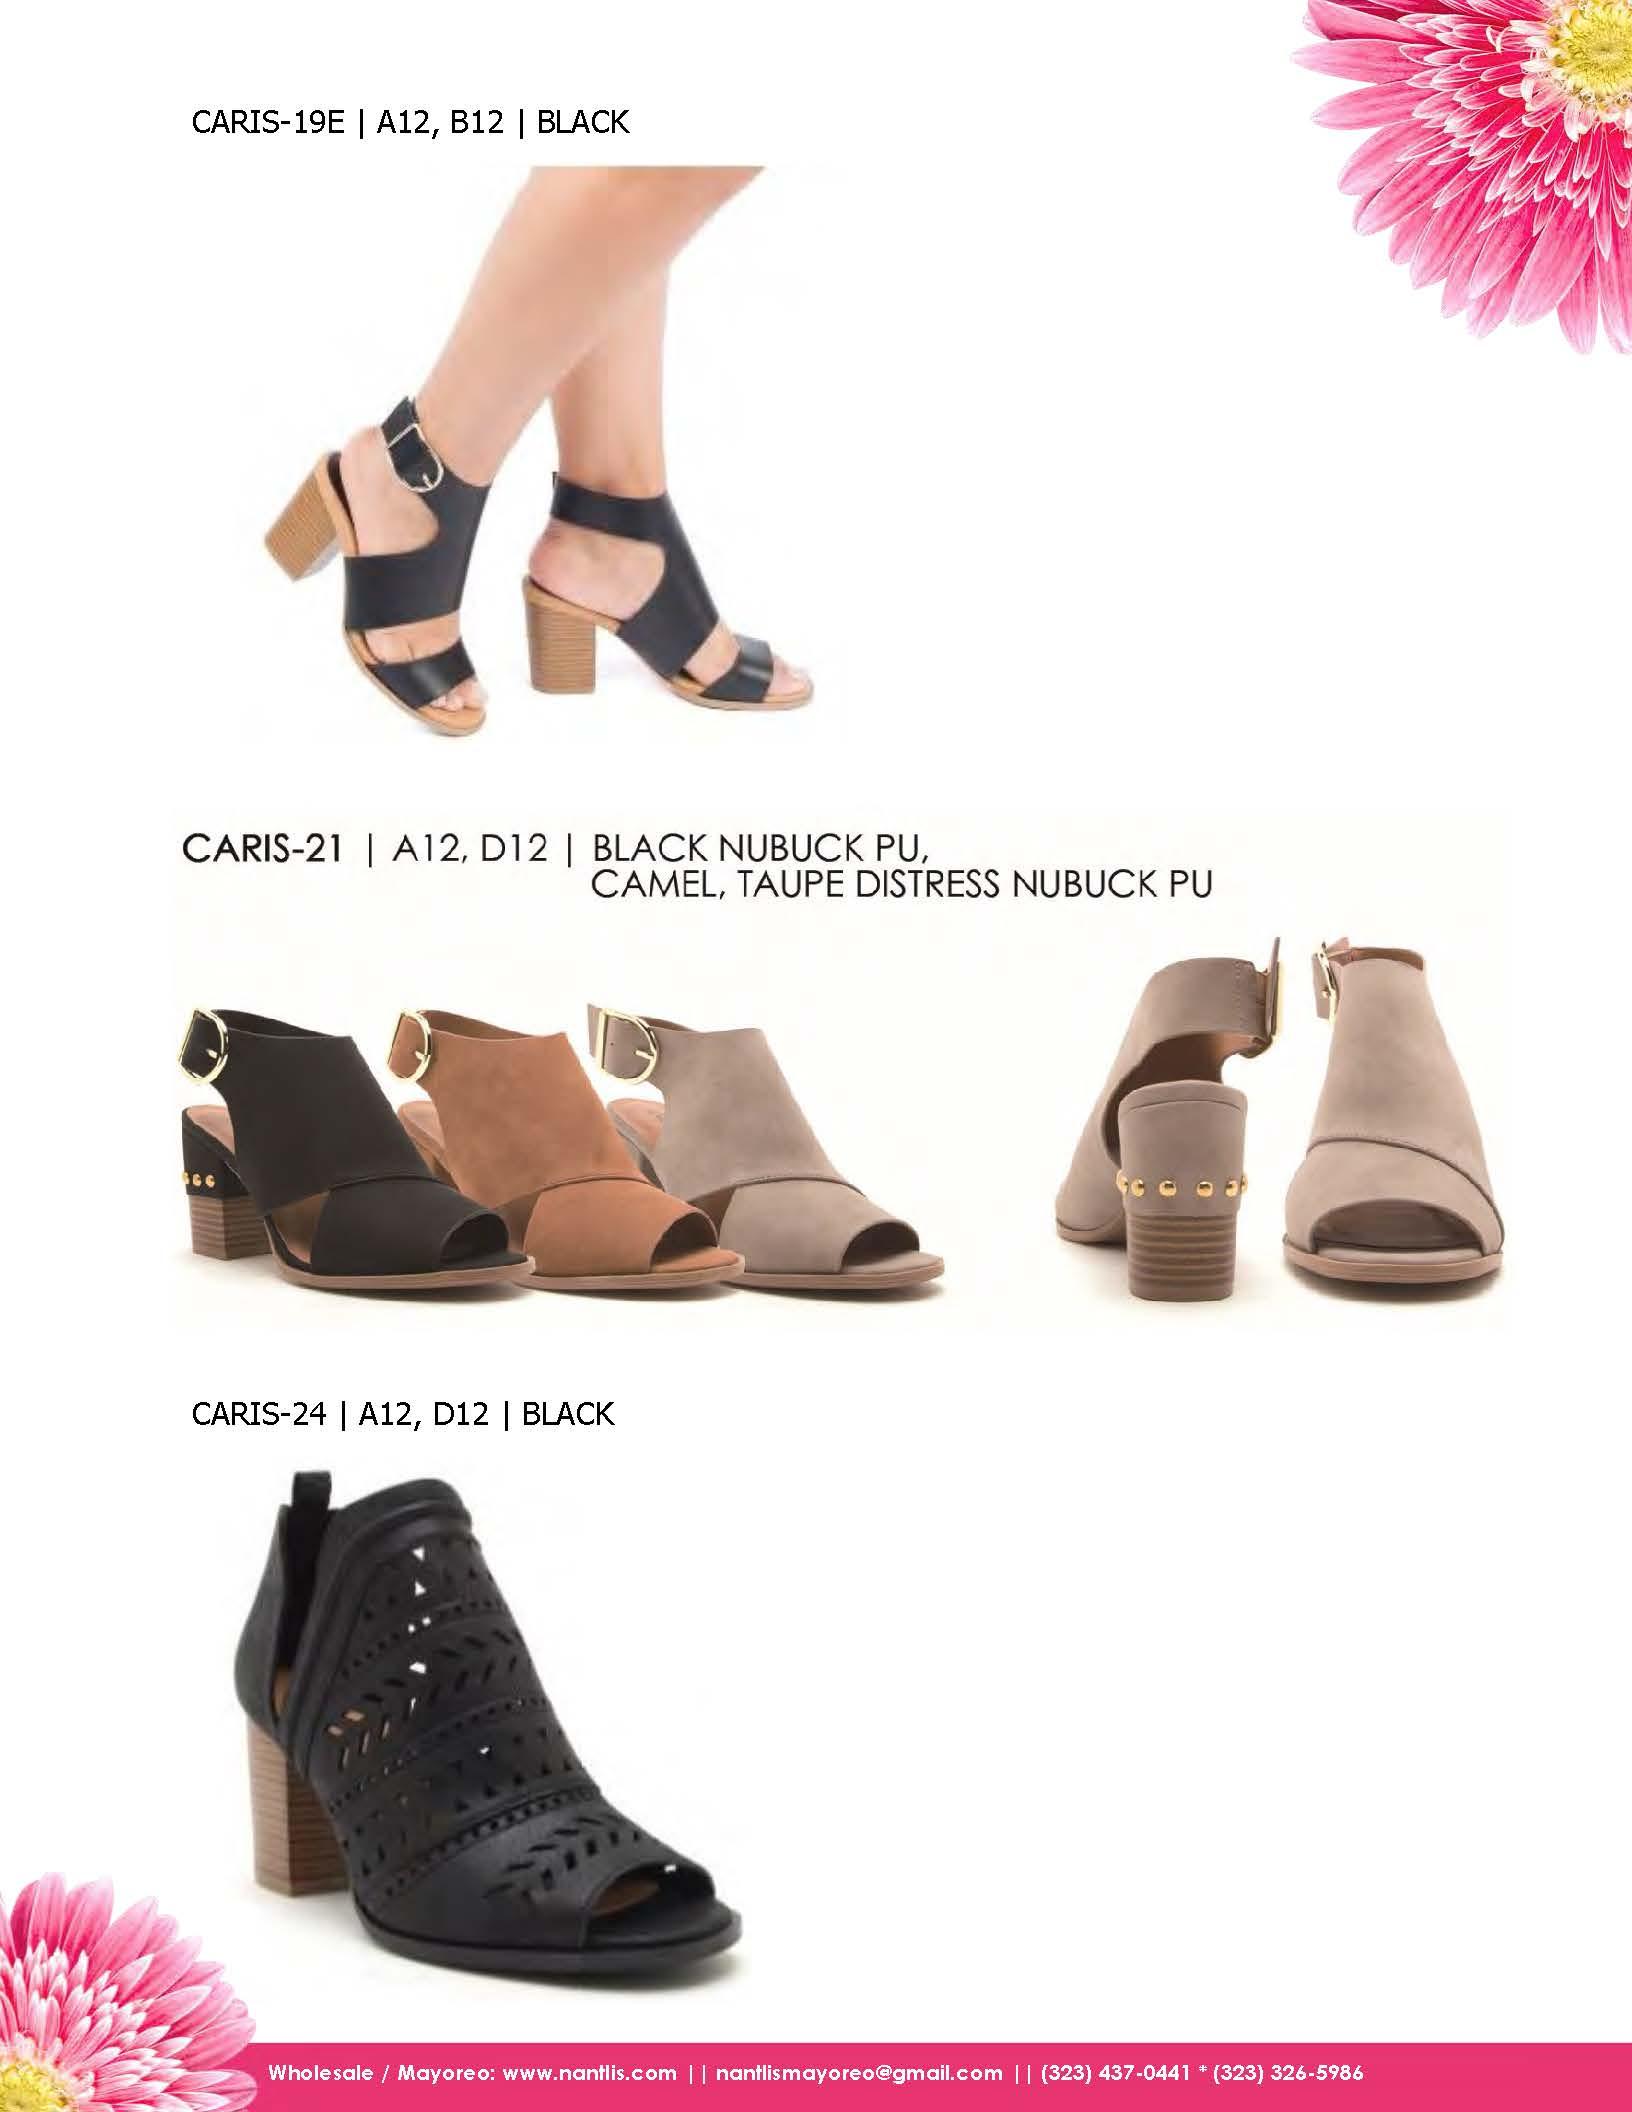 Nantlis Vol QU43 Zapatos para mujer mayoreo Wholesale shoes for women_Page_11